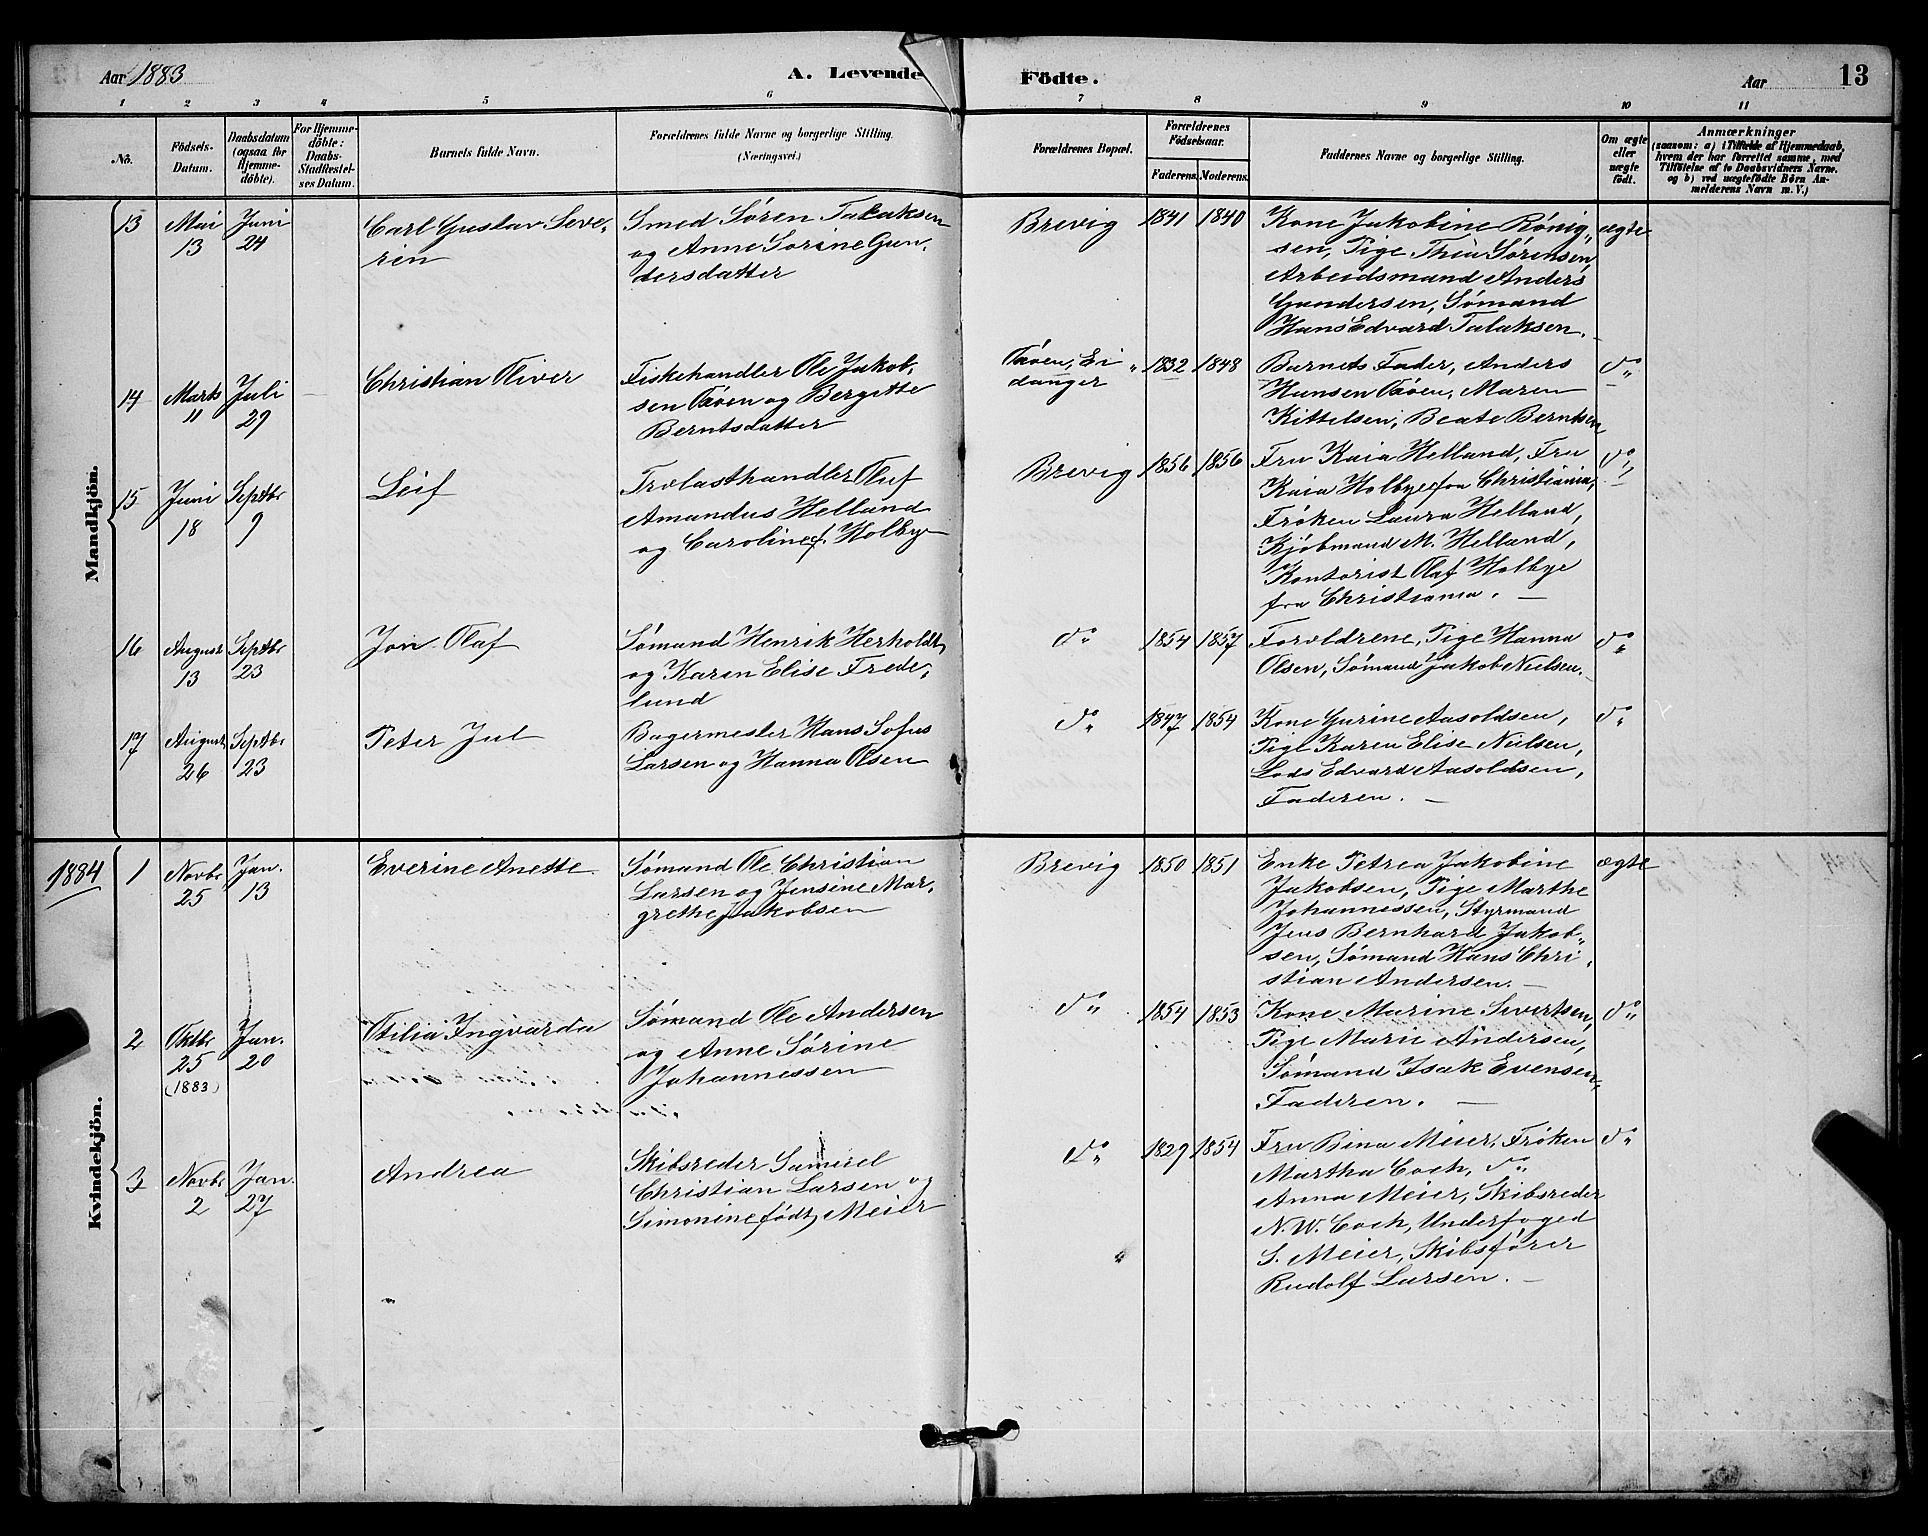 SAKO, Brevik kirkebøker, G/Ga/L0004: Klokkerbok nr. 4, 1882-1900, s. 13